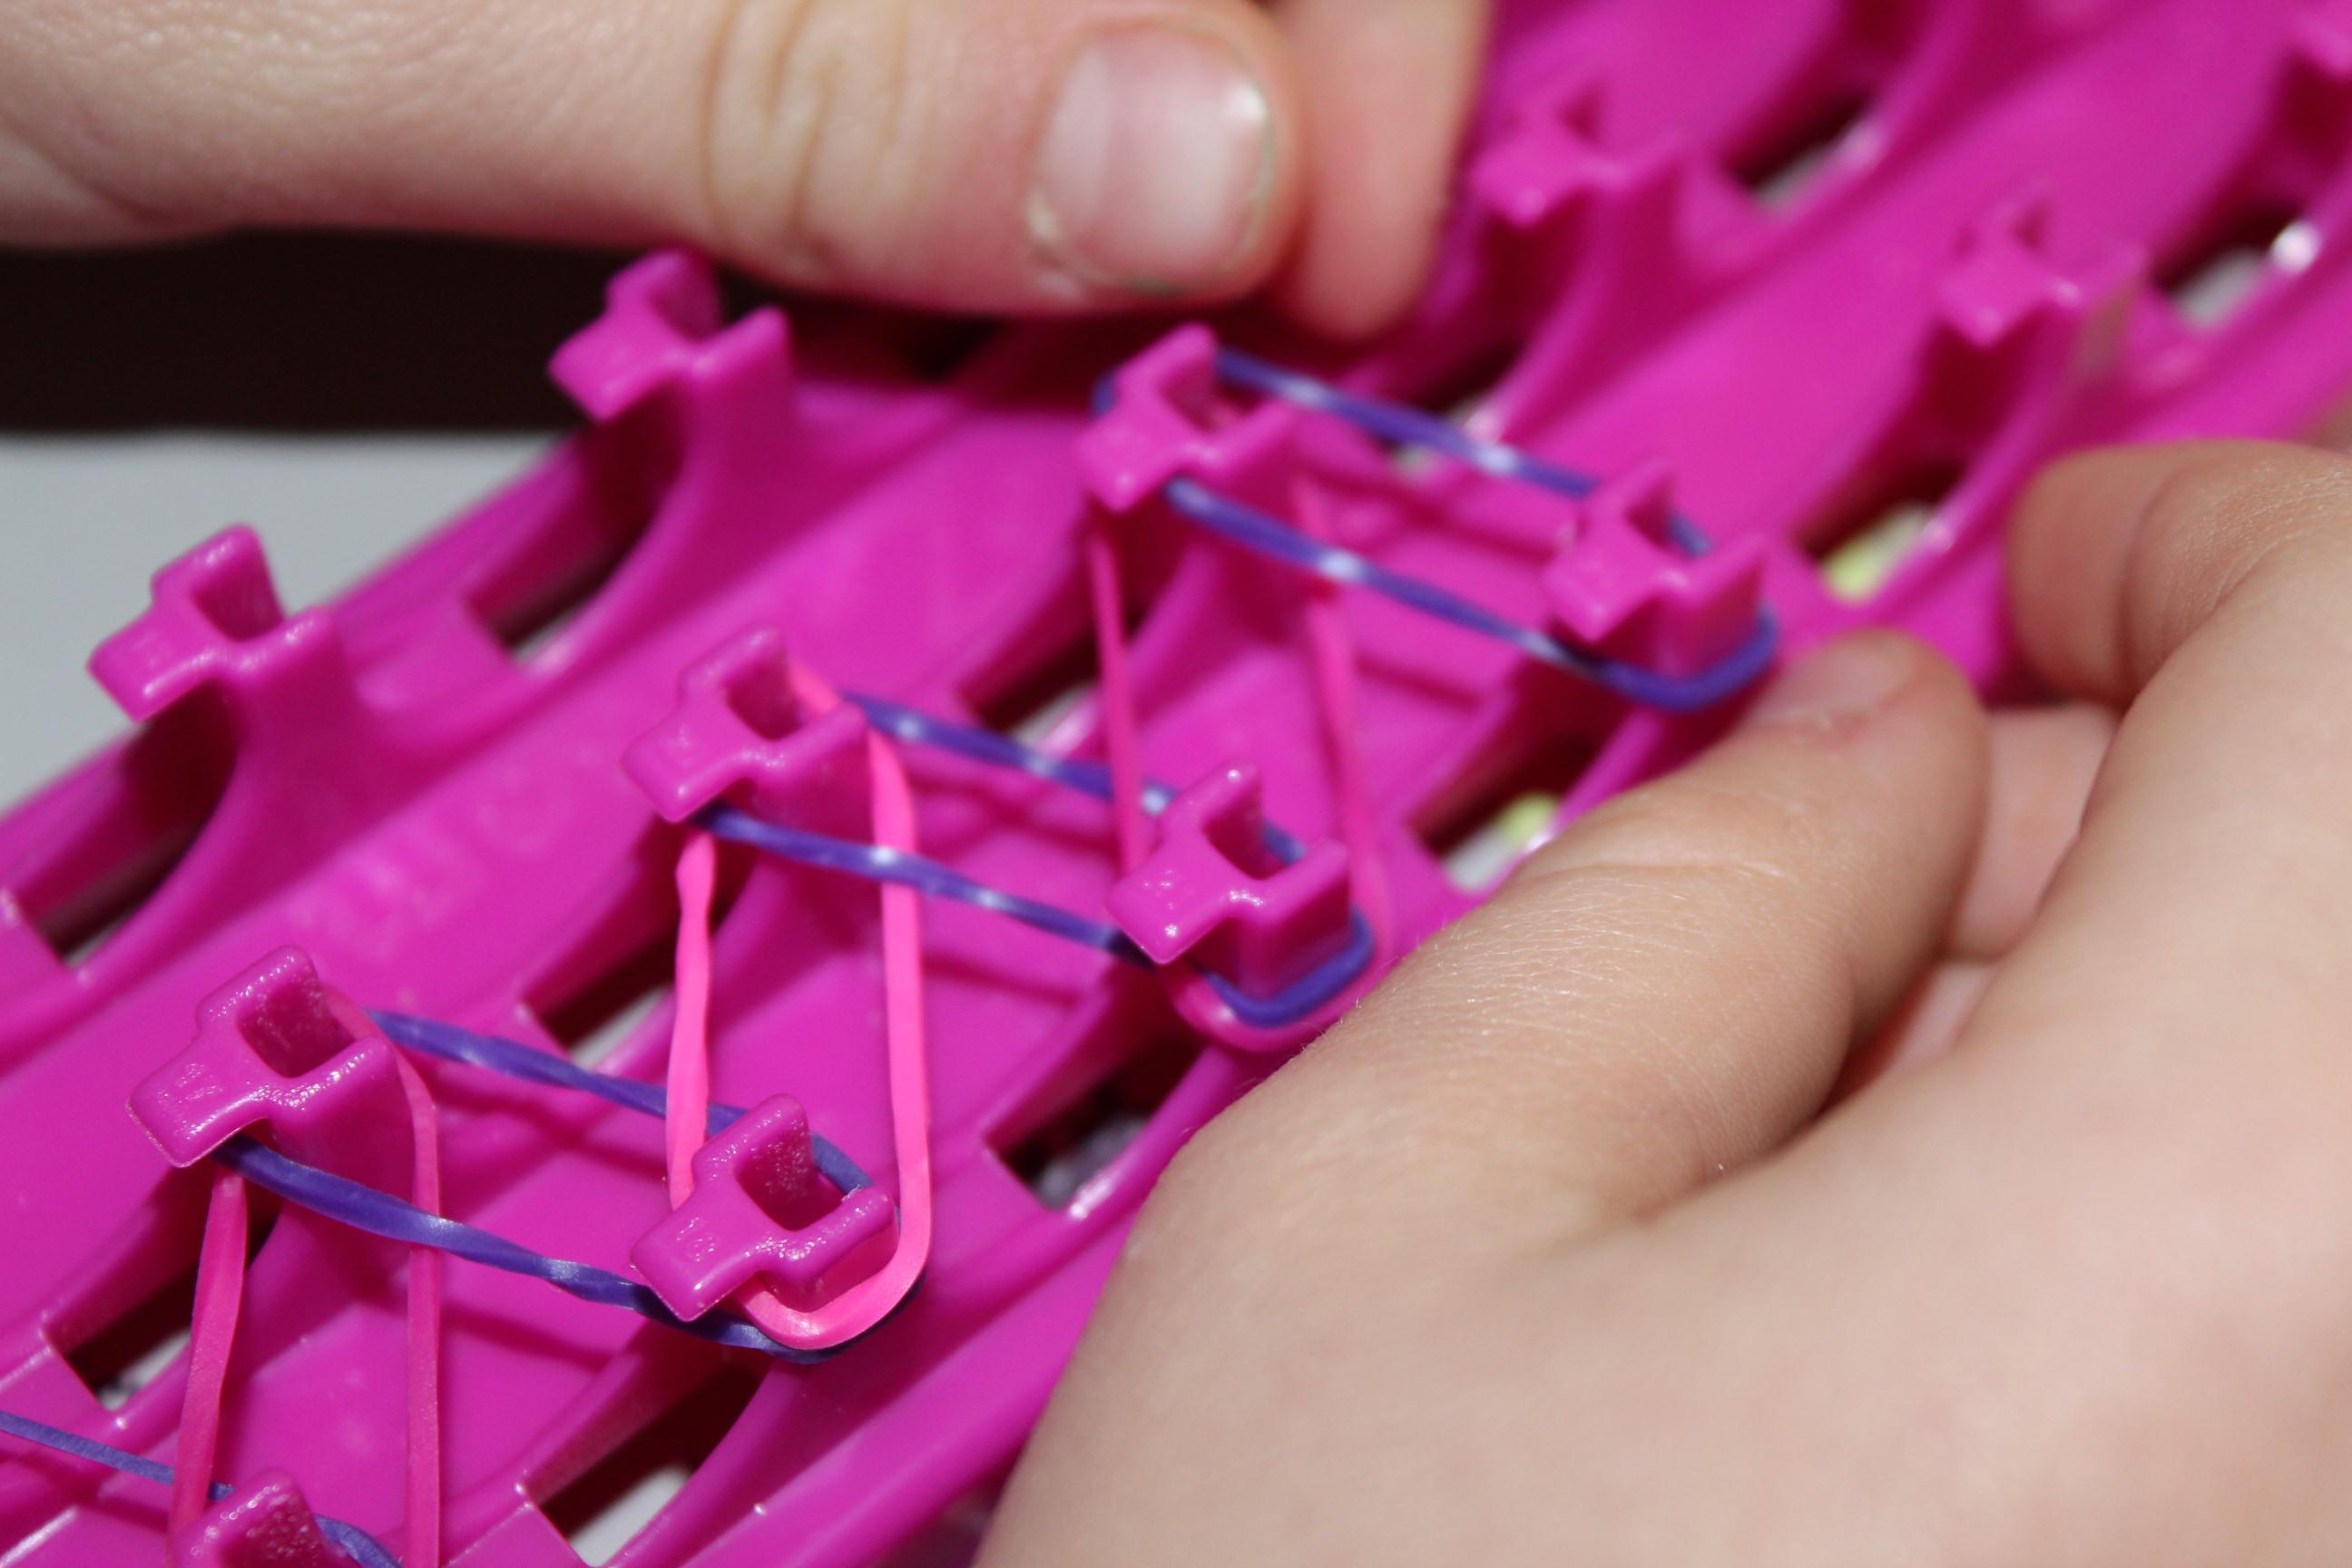 Fabrication du bracelet en elastique